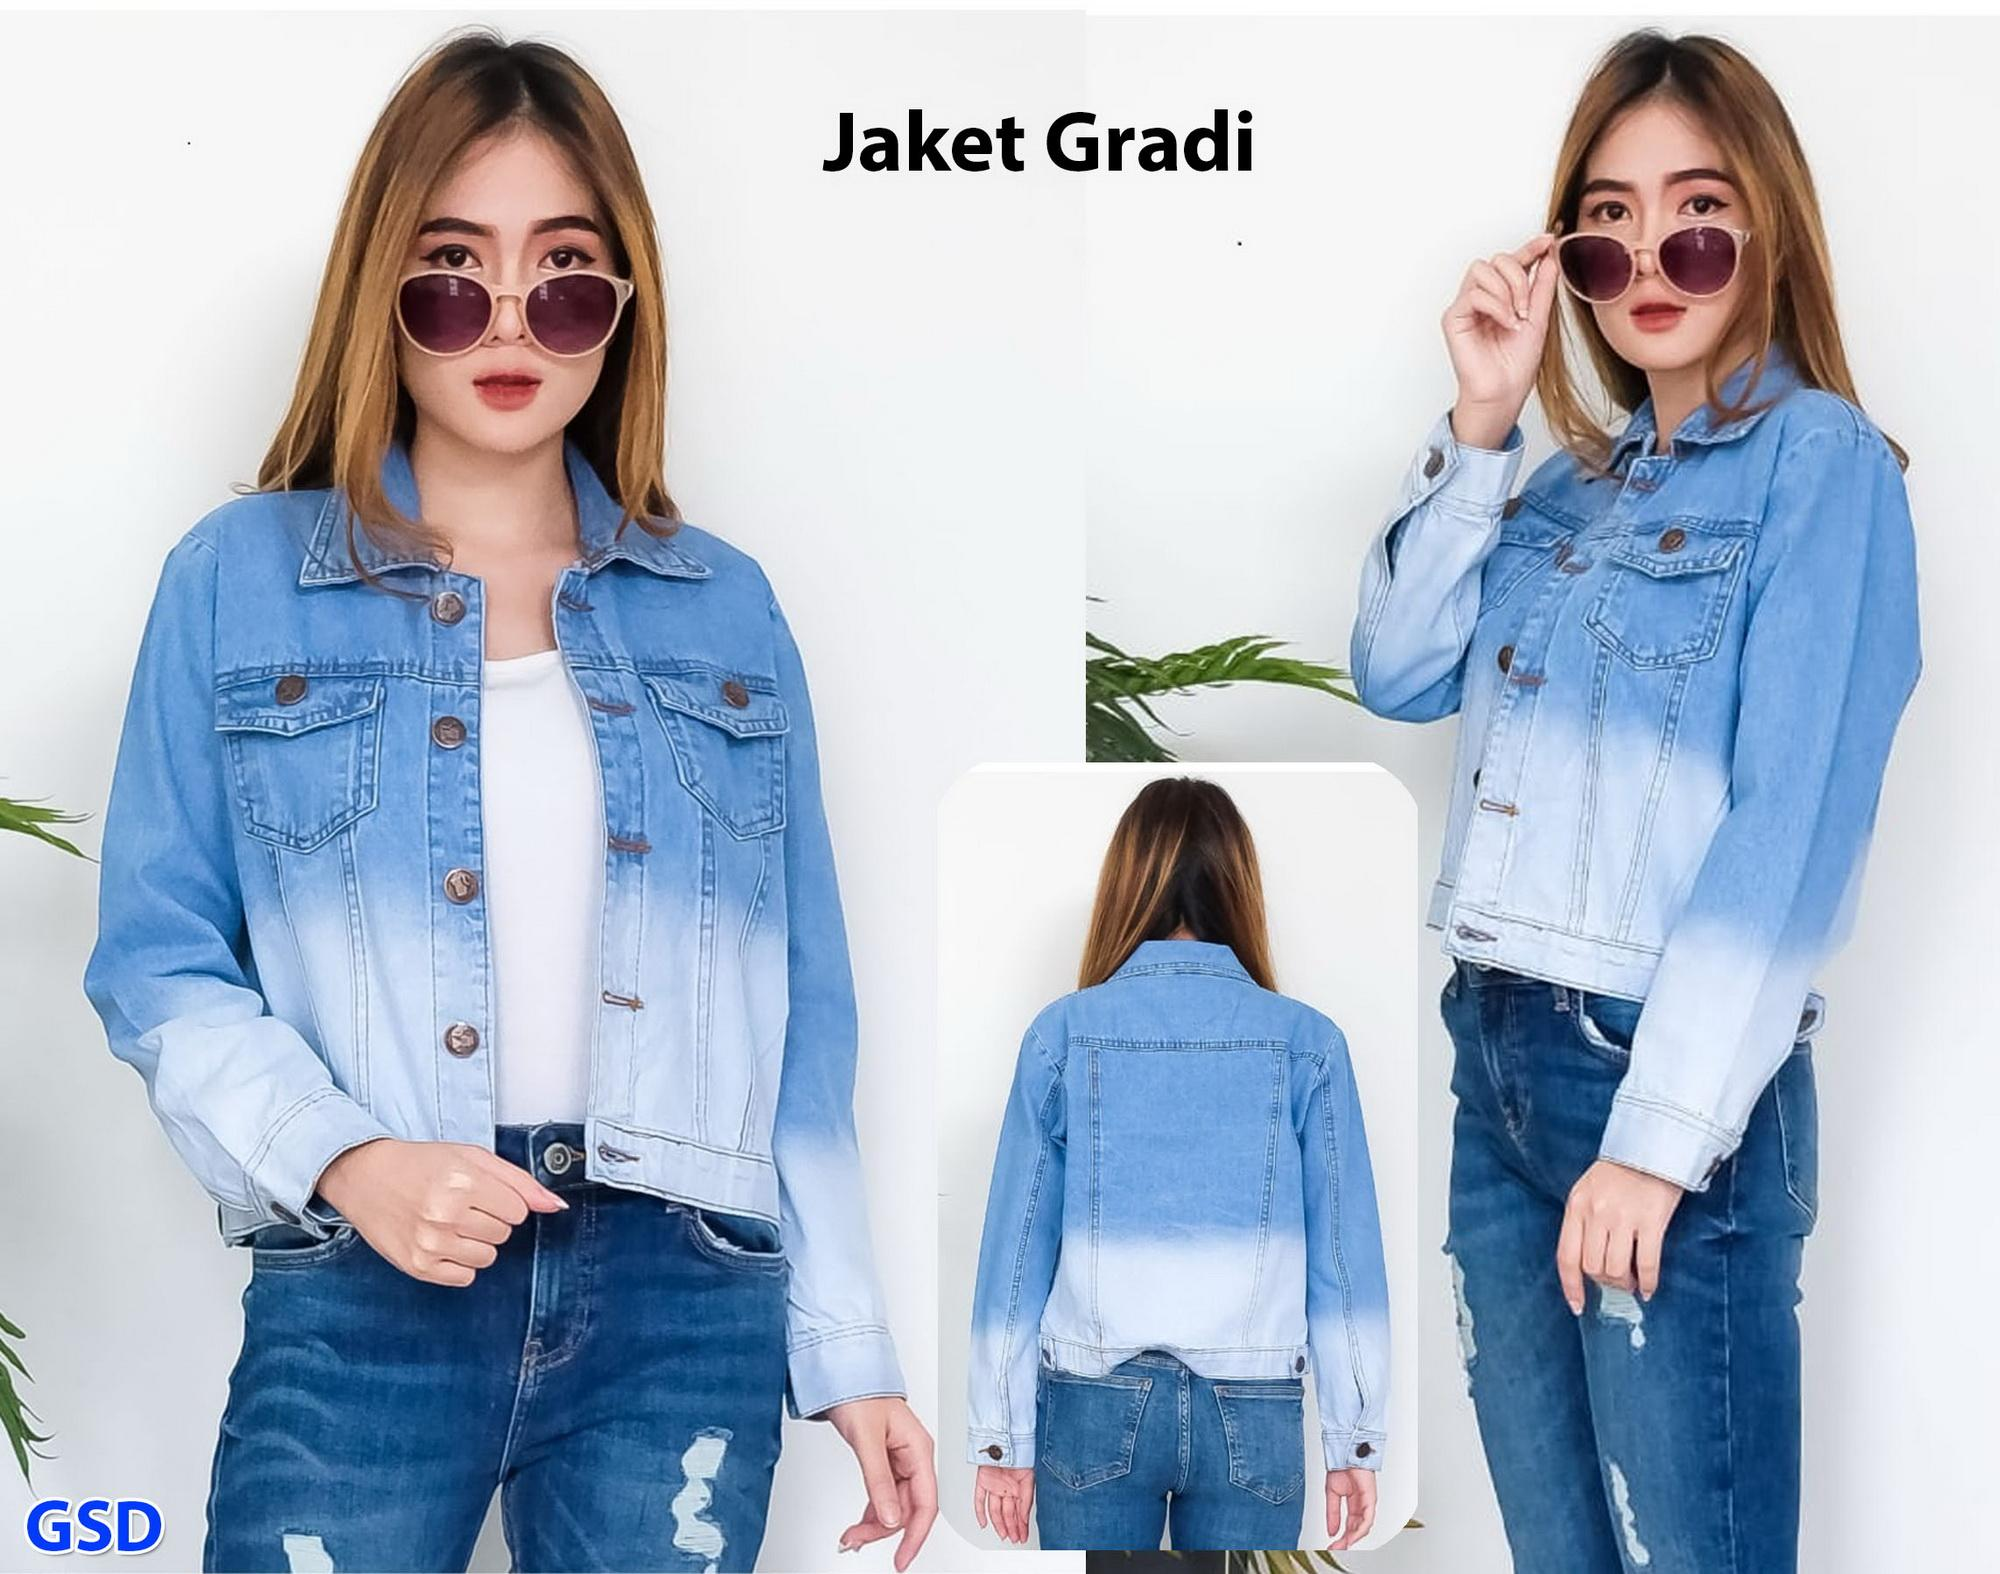 jaket gradi jaket jeans fashion wanita jaket jeans casual cewek jaket jeans  denim e28a6e8820